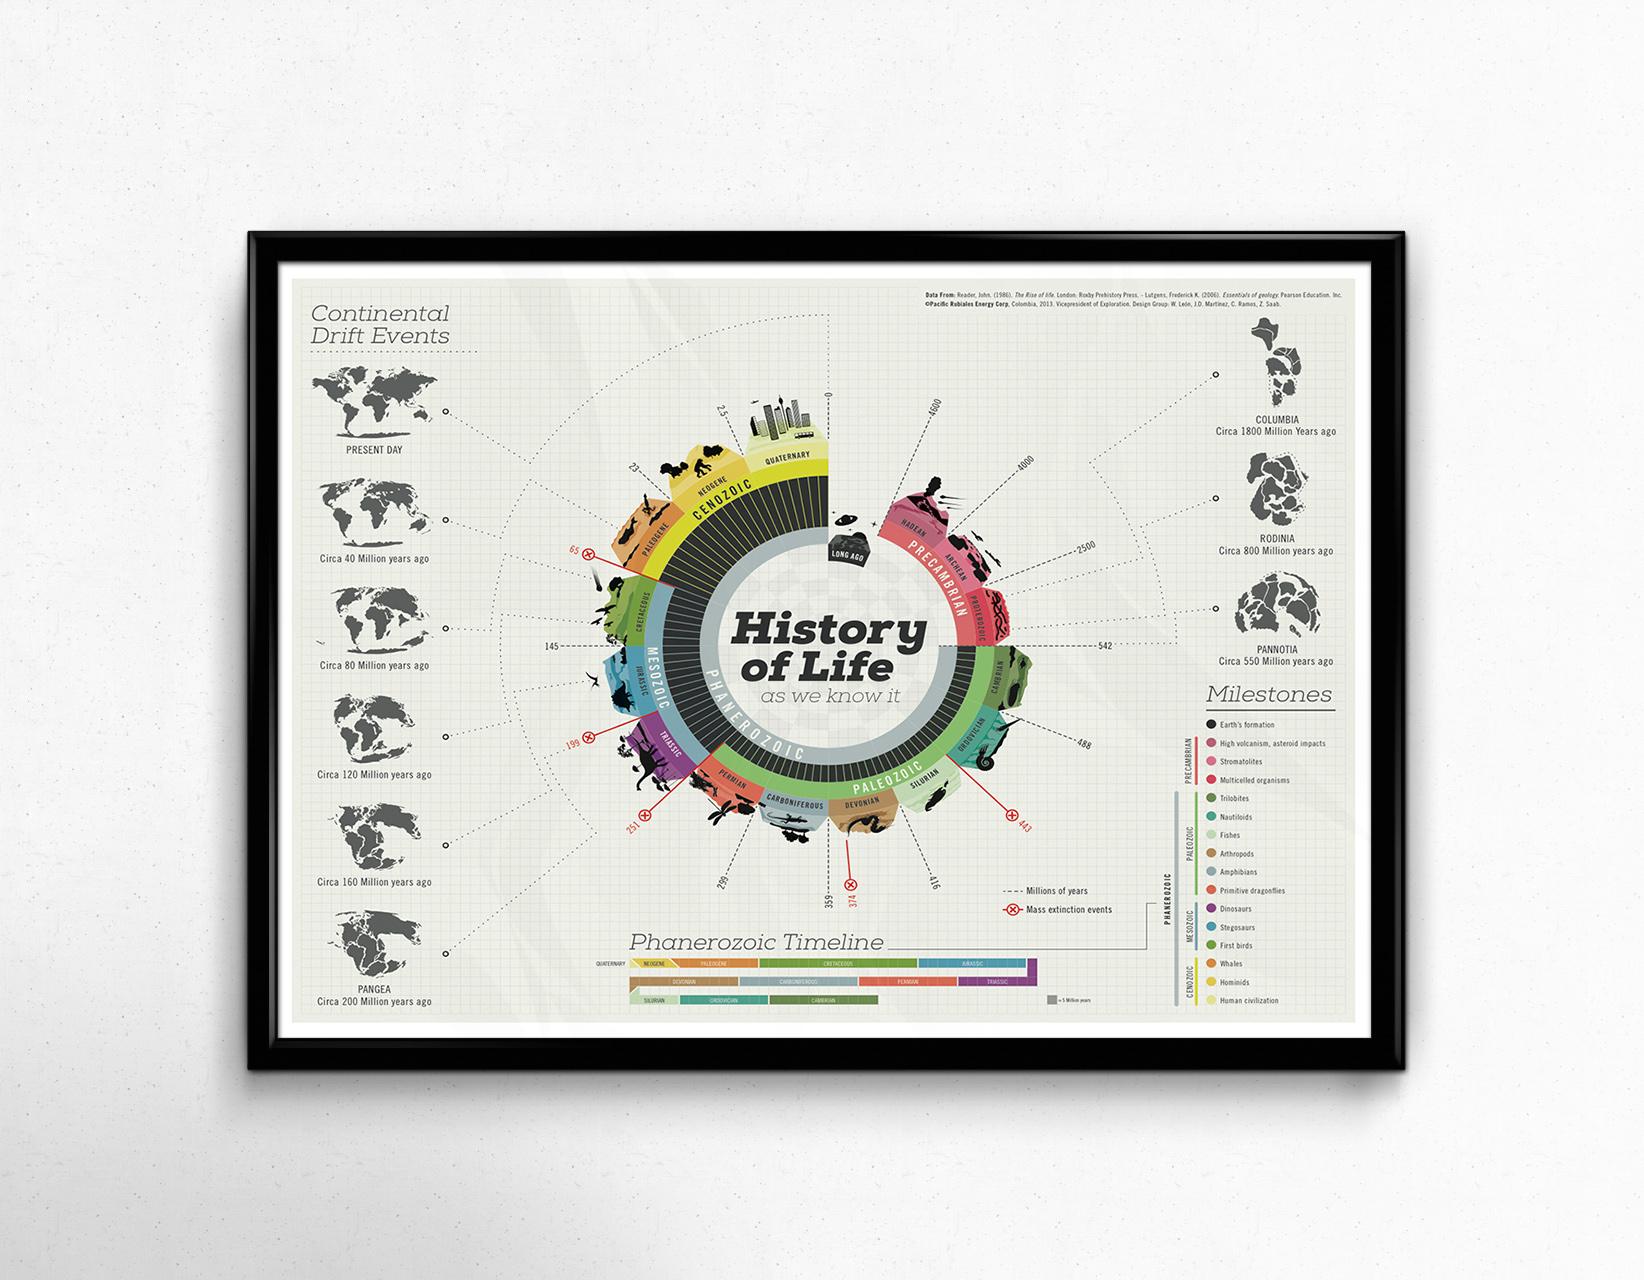 15  timeline infographic design examples  u0026 ideas